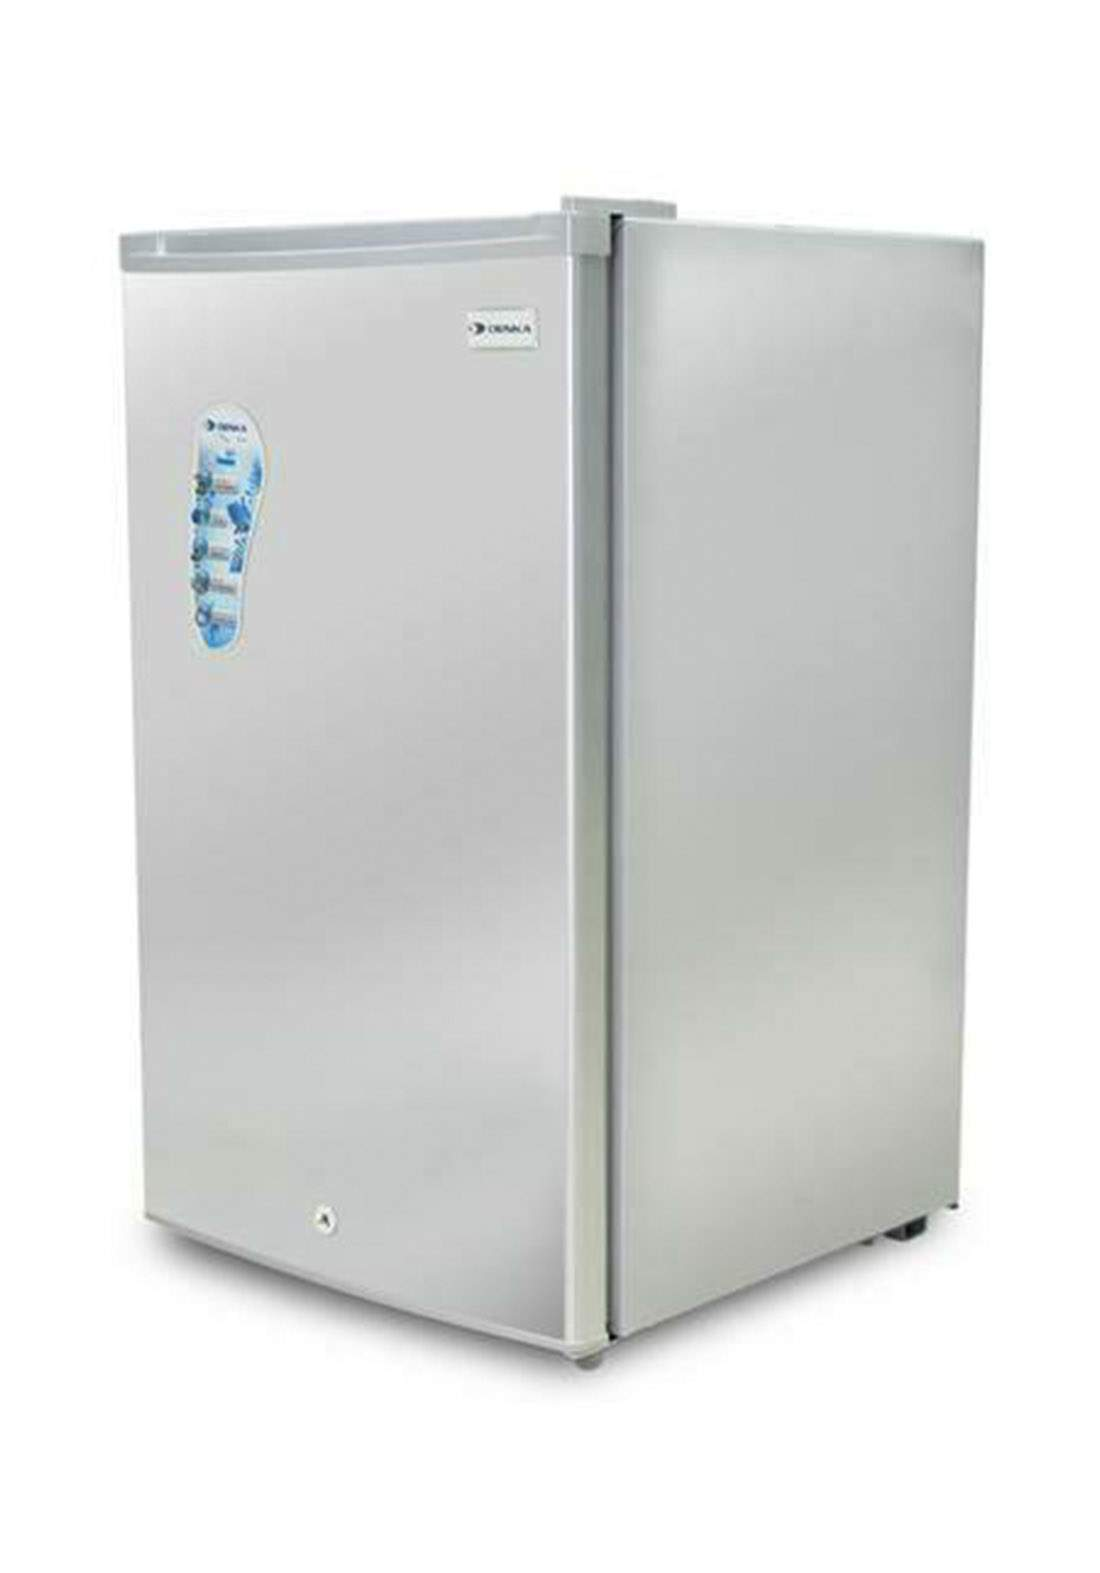 Denka GCF-130VTCT  Upright Freezer 130L Direct Cool مجمدة عمودية